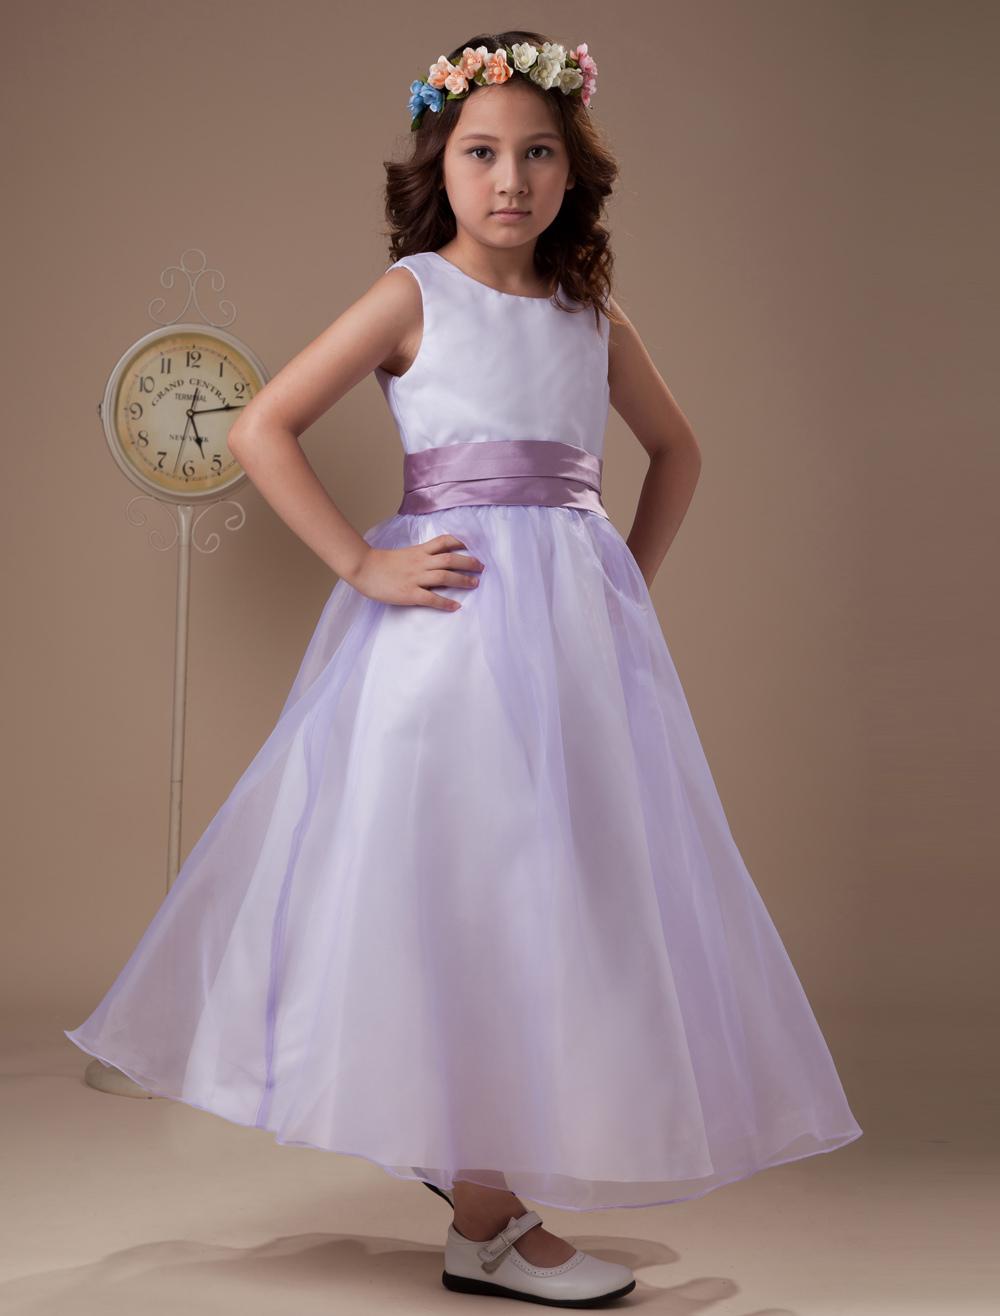 Lavender Sleeveless Sash Taffeta Organza Flower Girl Dress